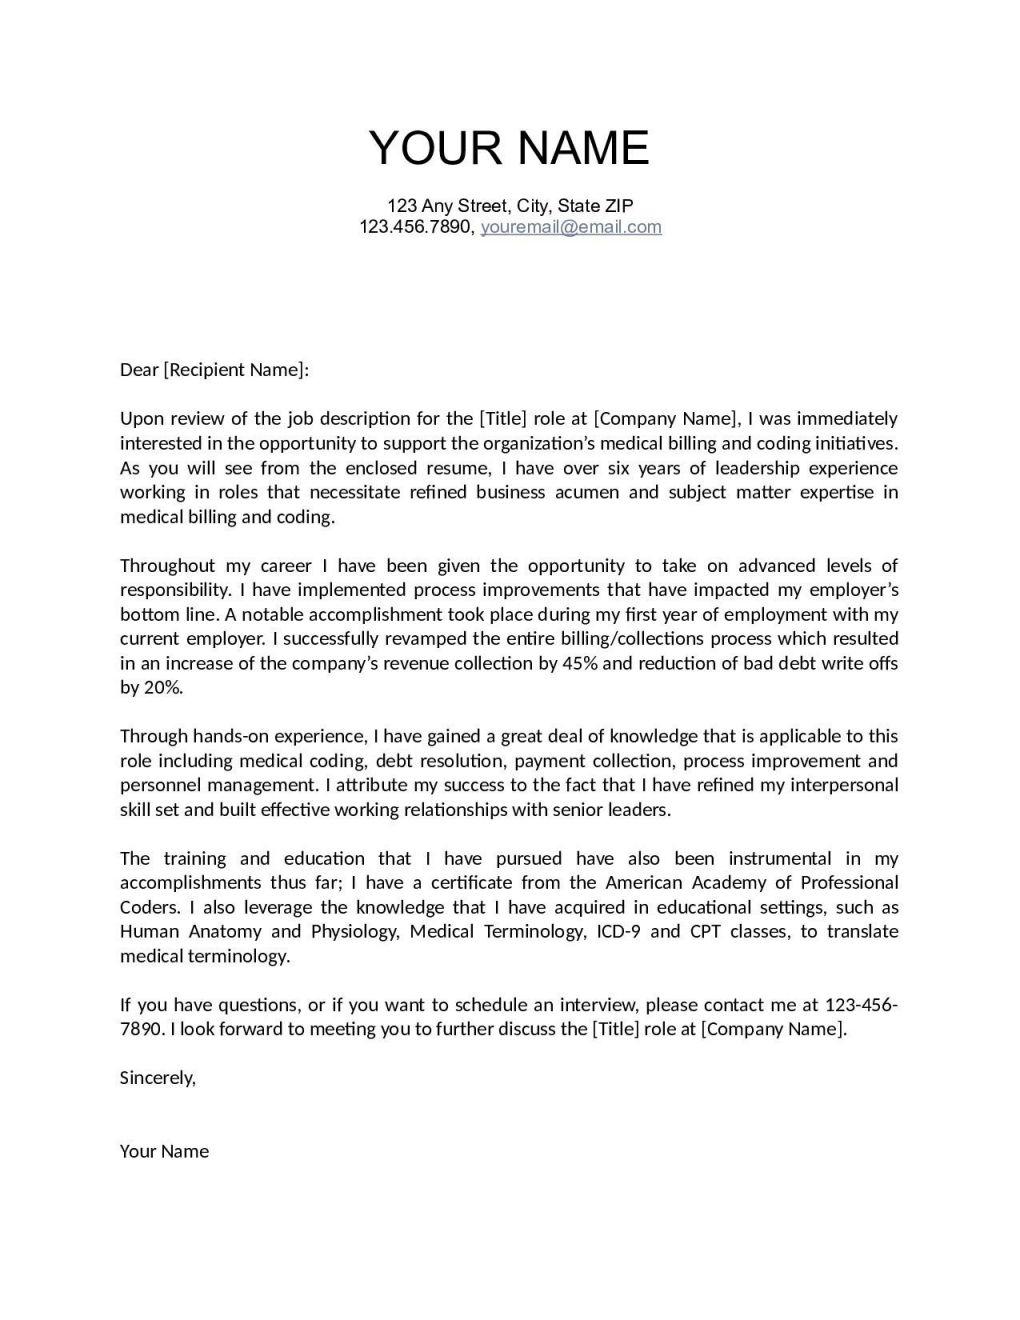 Visa Letter Template - Unique Visa Support Letter On27 – Documentaries for Change